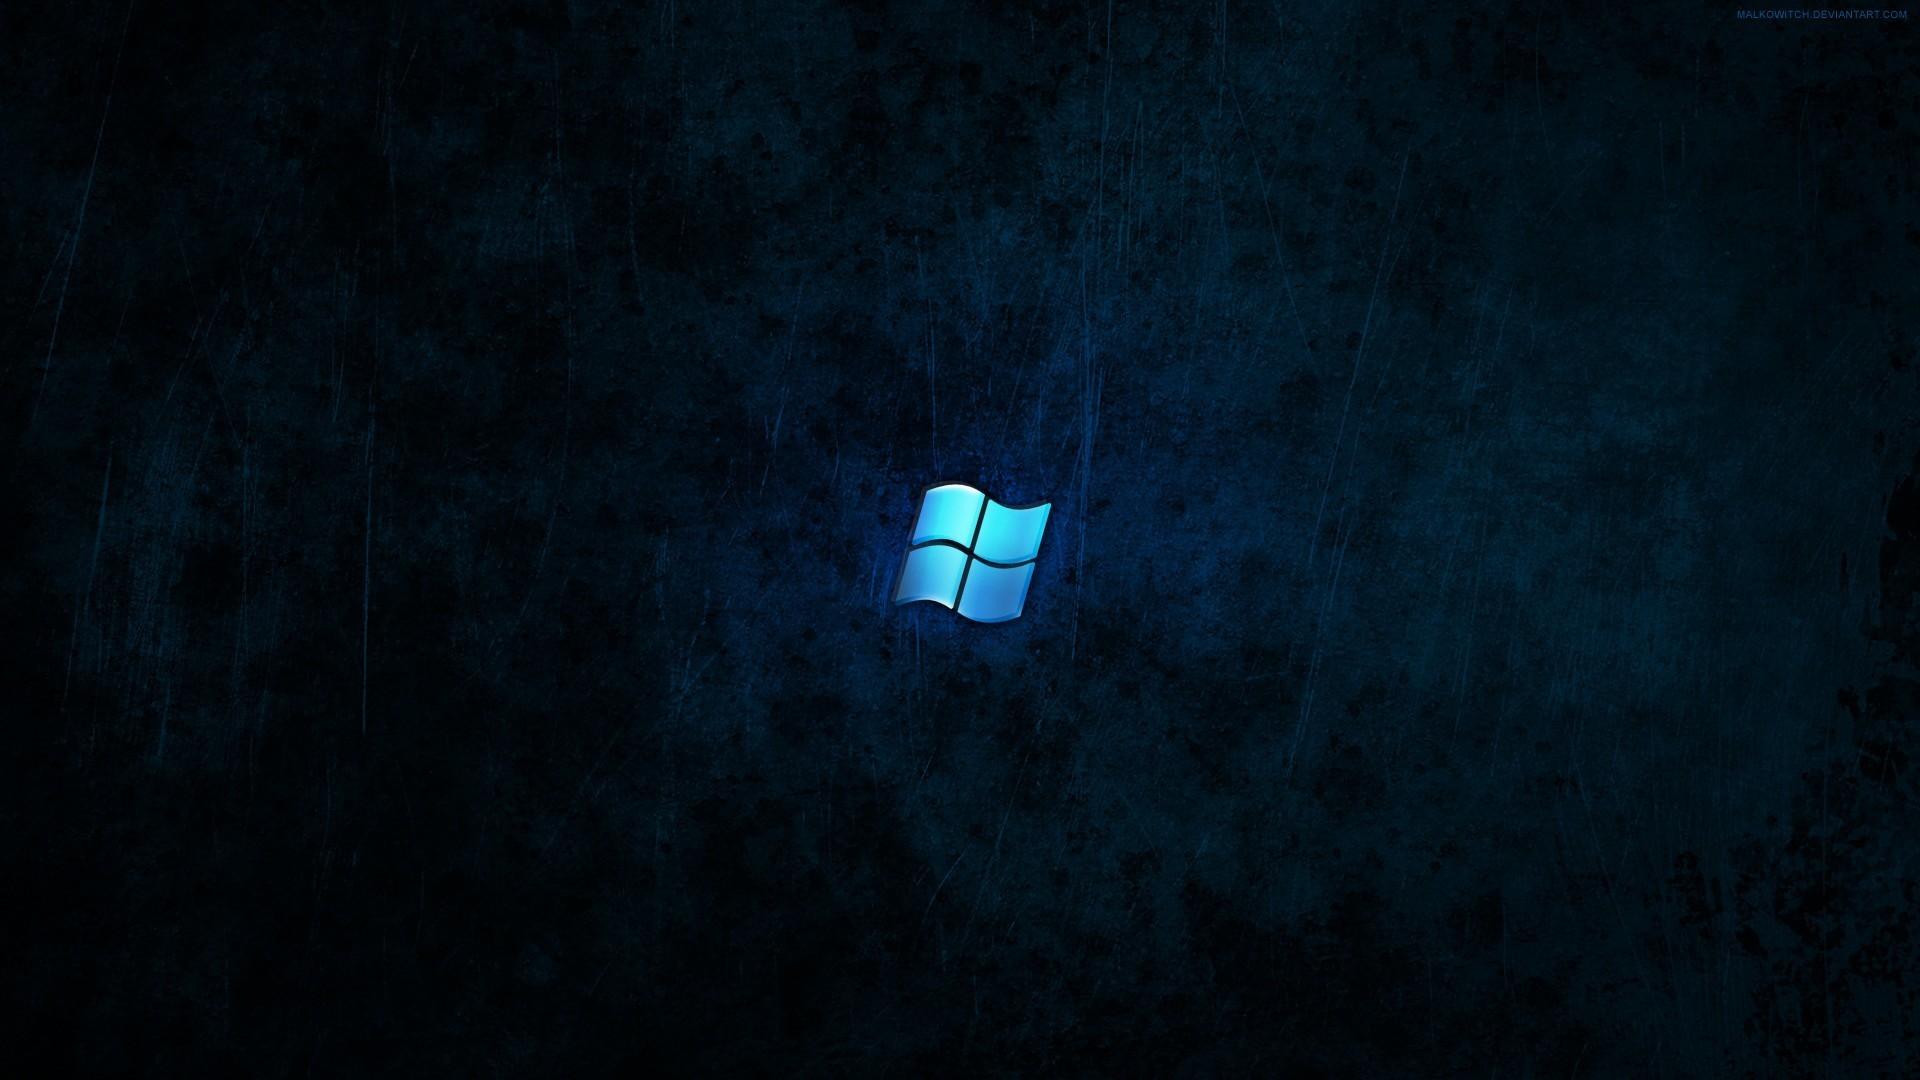 Home > High Tech HD Wallpapers > Windows 10, Logo, Background